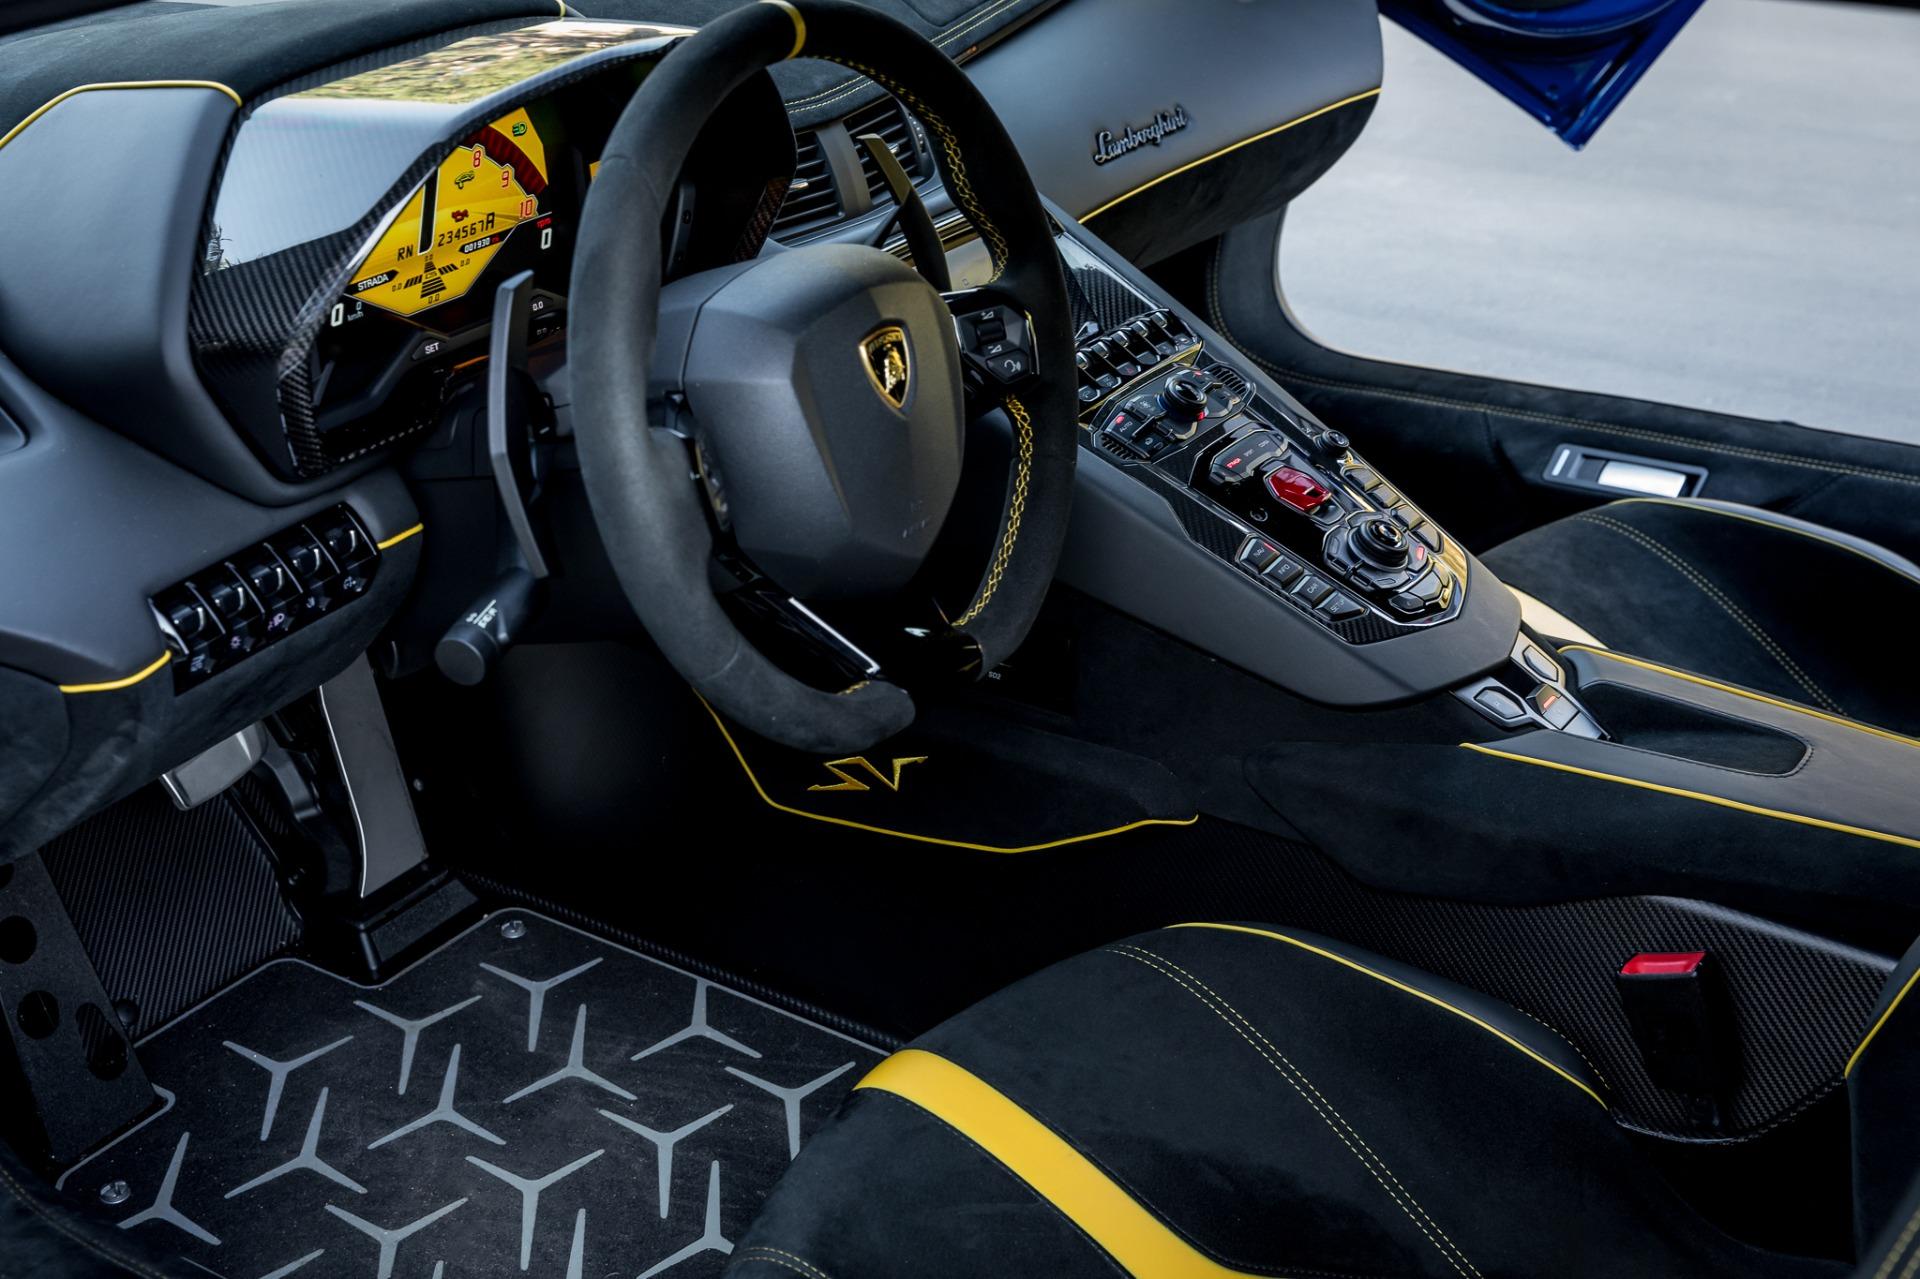 Used 2017 Lamborghini Aventador LP 750-4 SV / 740HP / AWD / 1930 MI / NAV / CAMERA for sale Sold at Formula Imports in Charlotte NC 28227 54